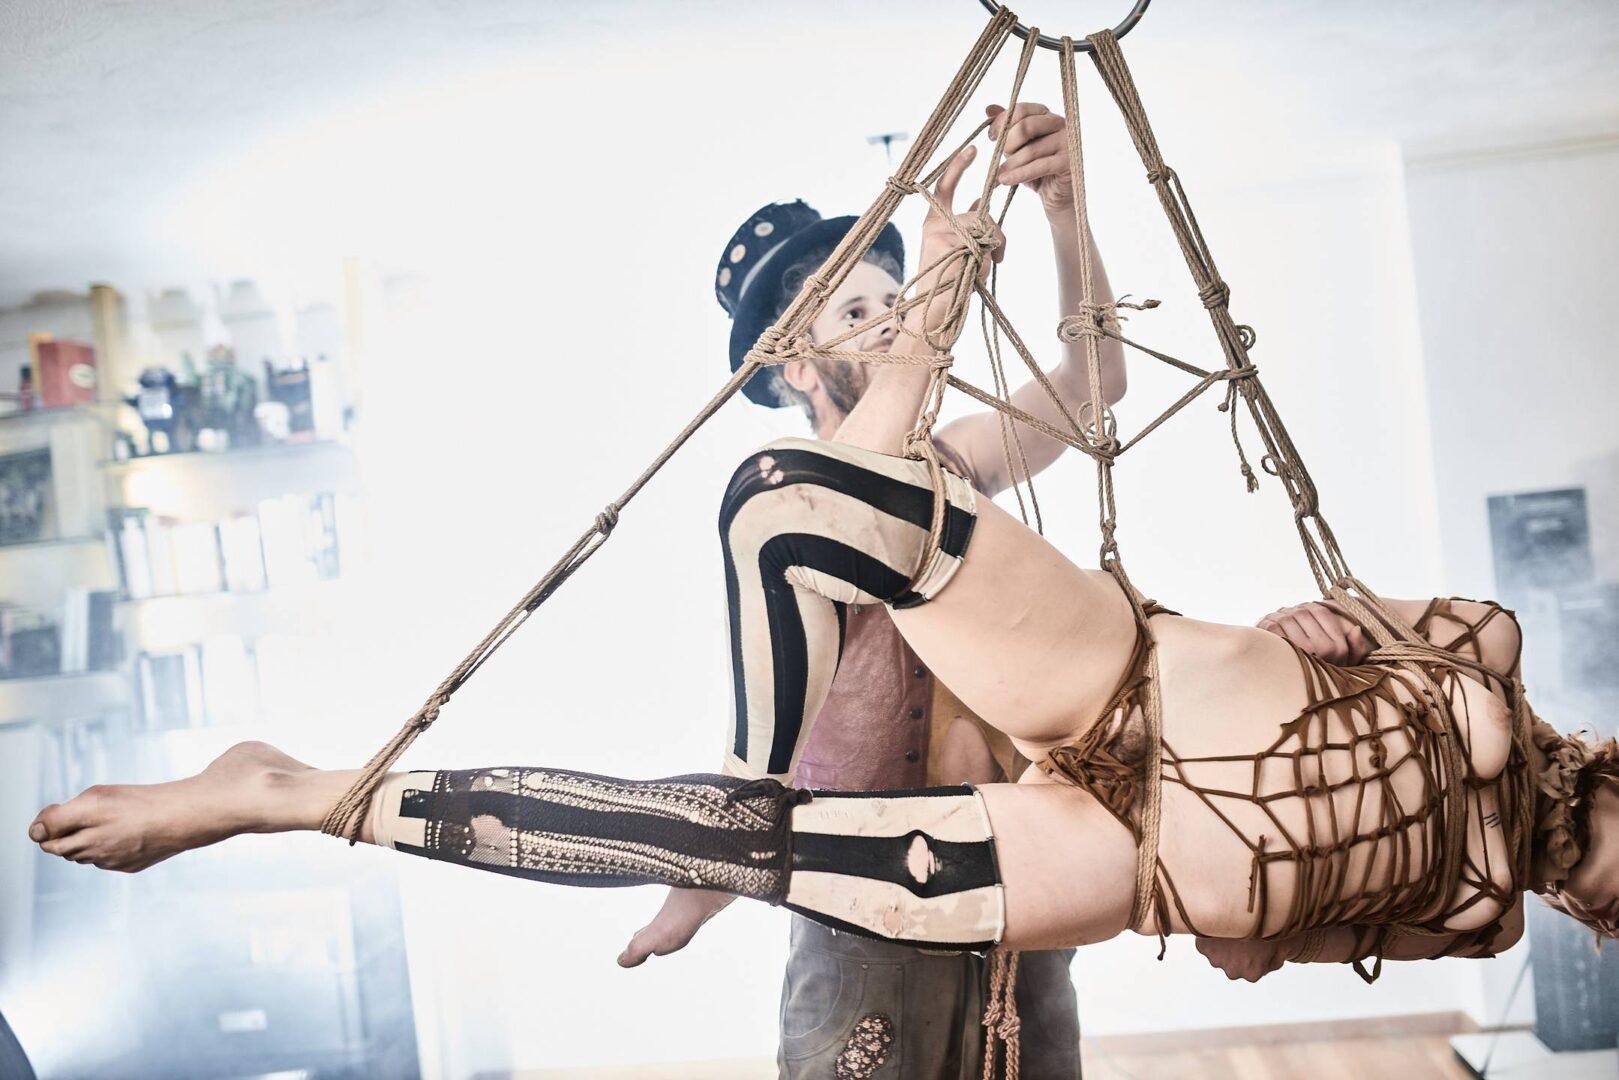 Steampunk Circus Shibari - 10